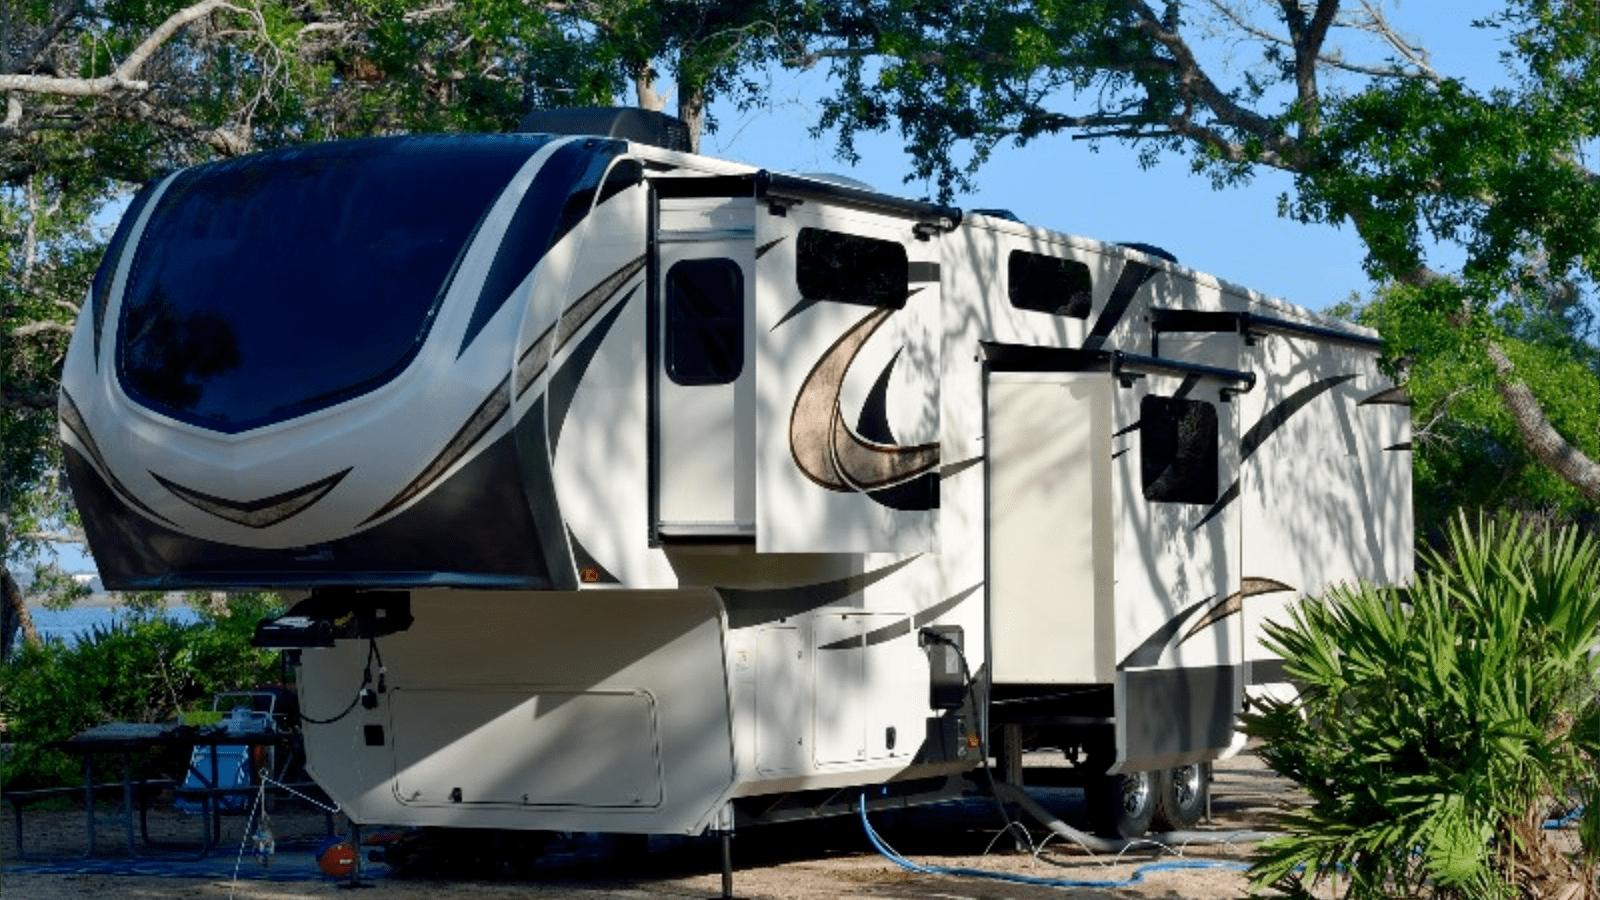 New & Used RVs Arlington TX, Used Motorhomes DFW, Travel Trailer RVs